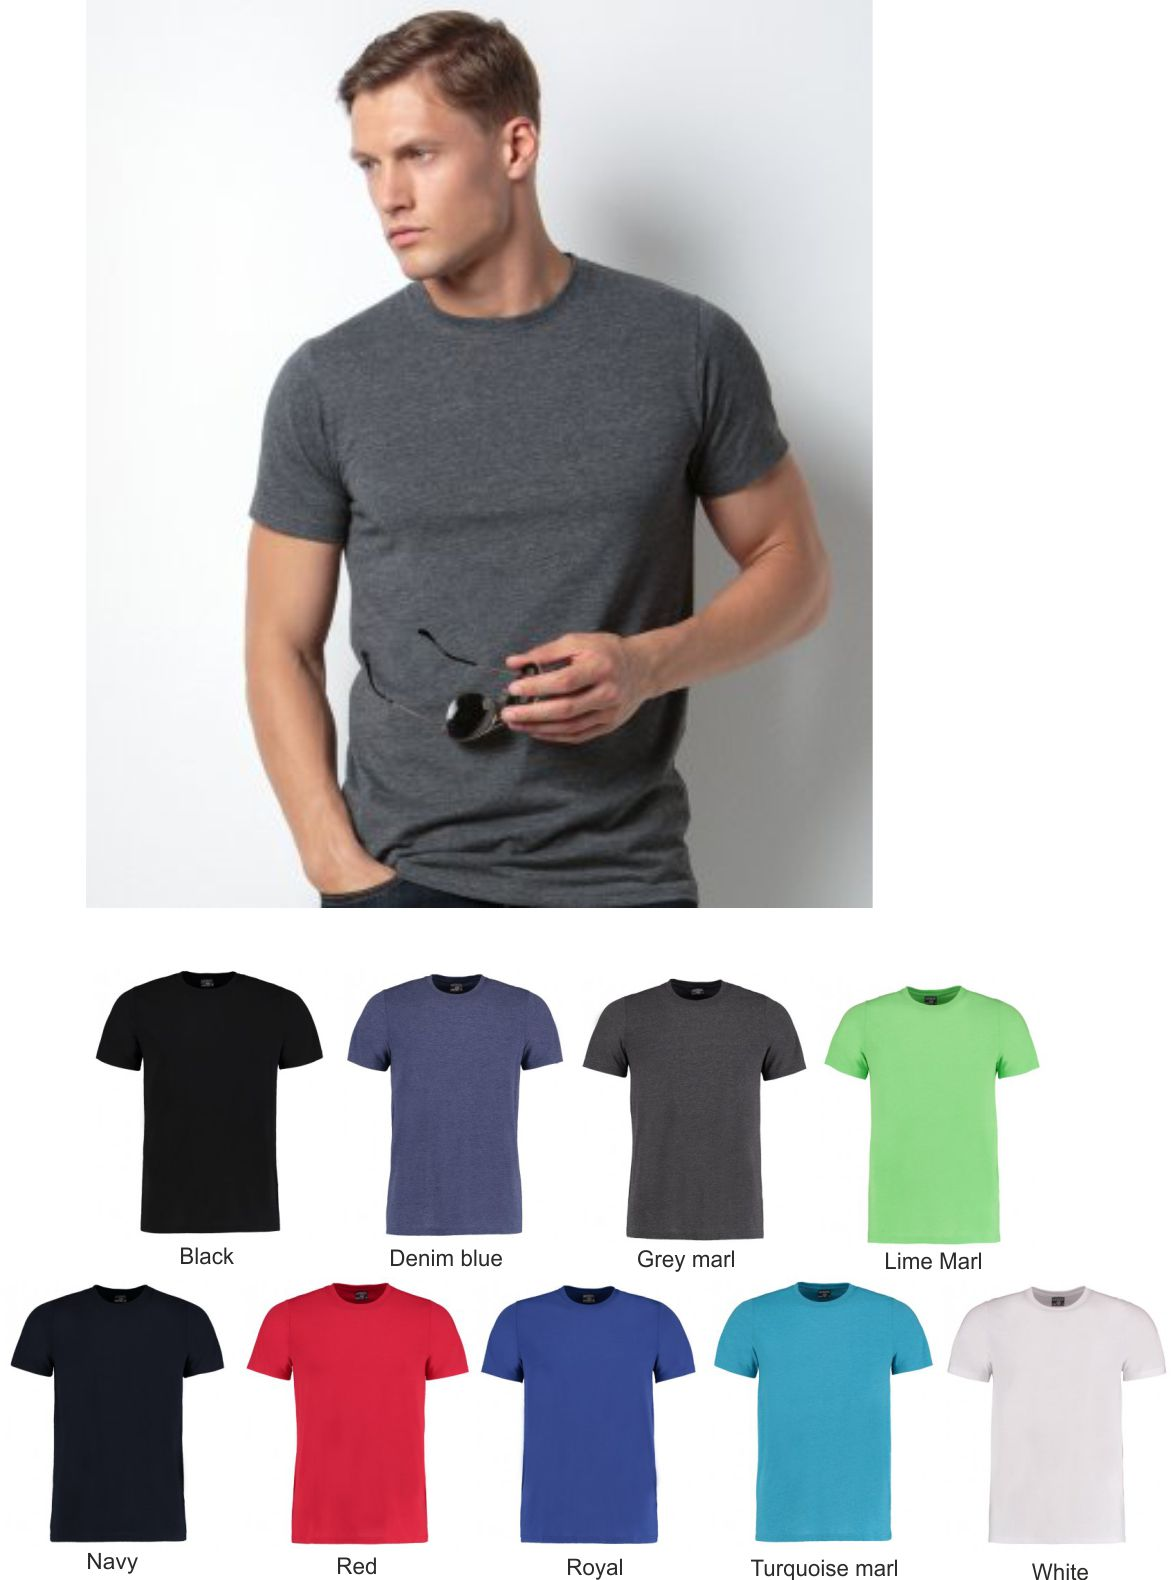 9cd501b5c Kustom Kit KK504 Superwash 60 degrees Tee Shirt - £6.88 : Ark ...